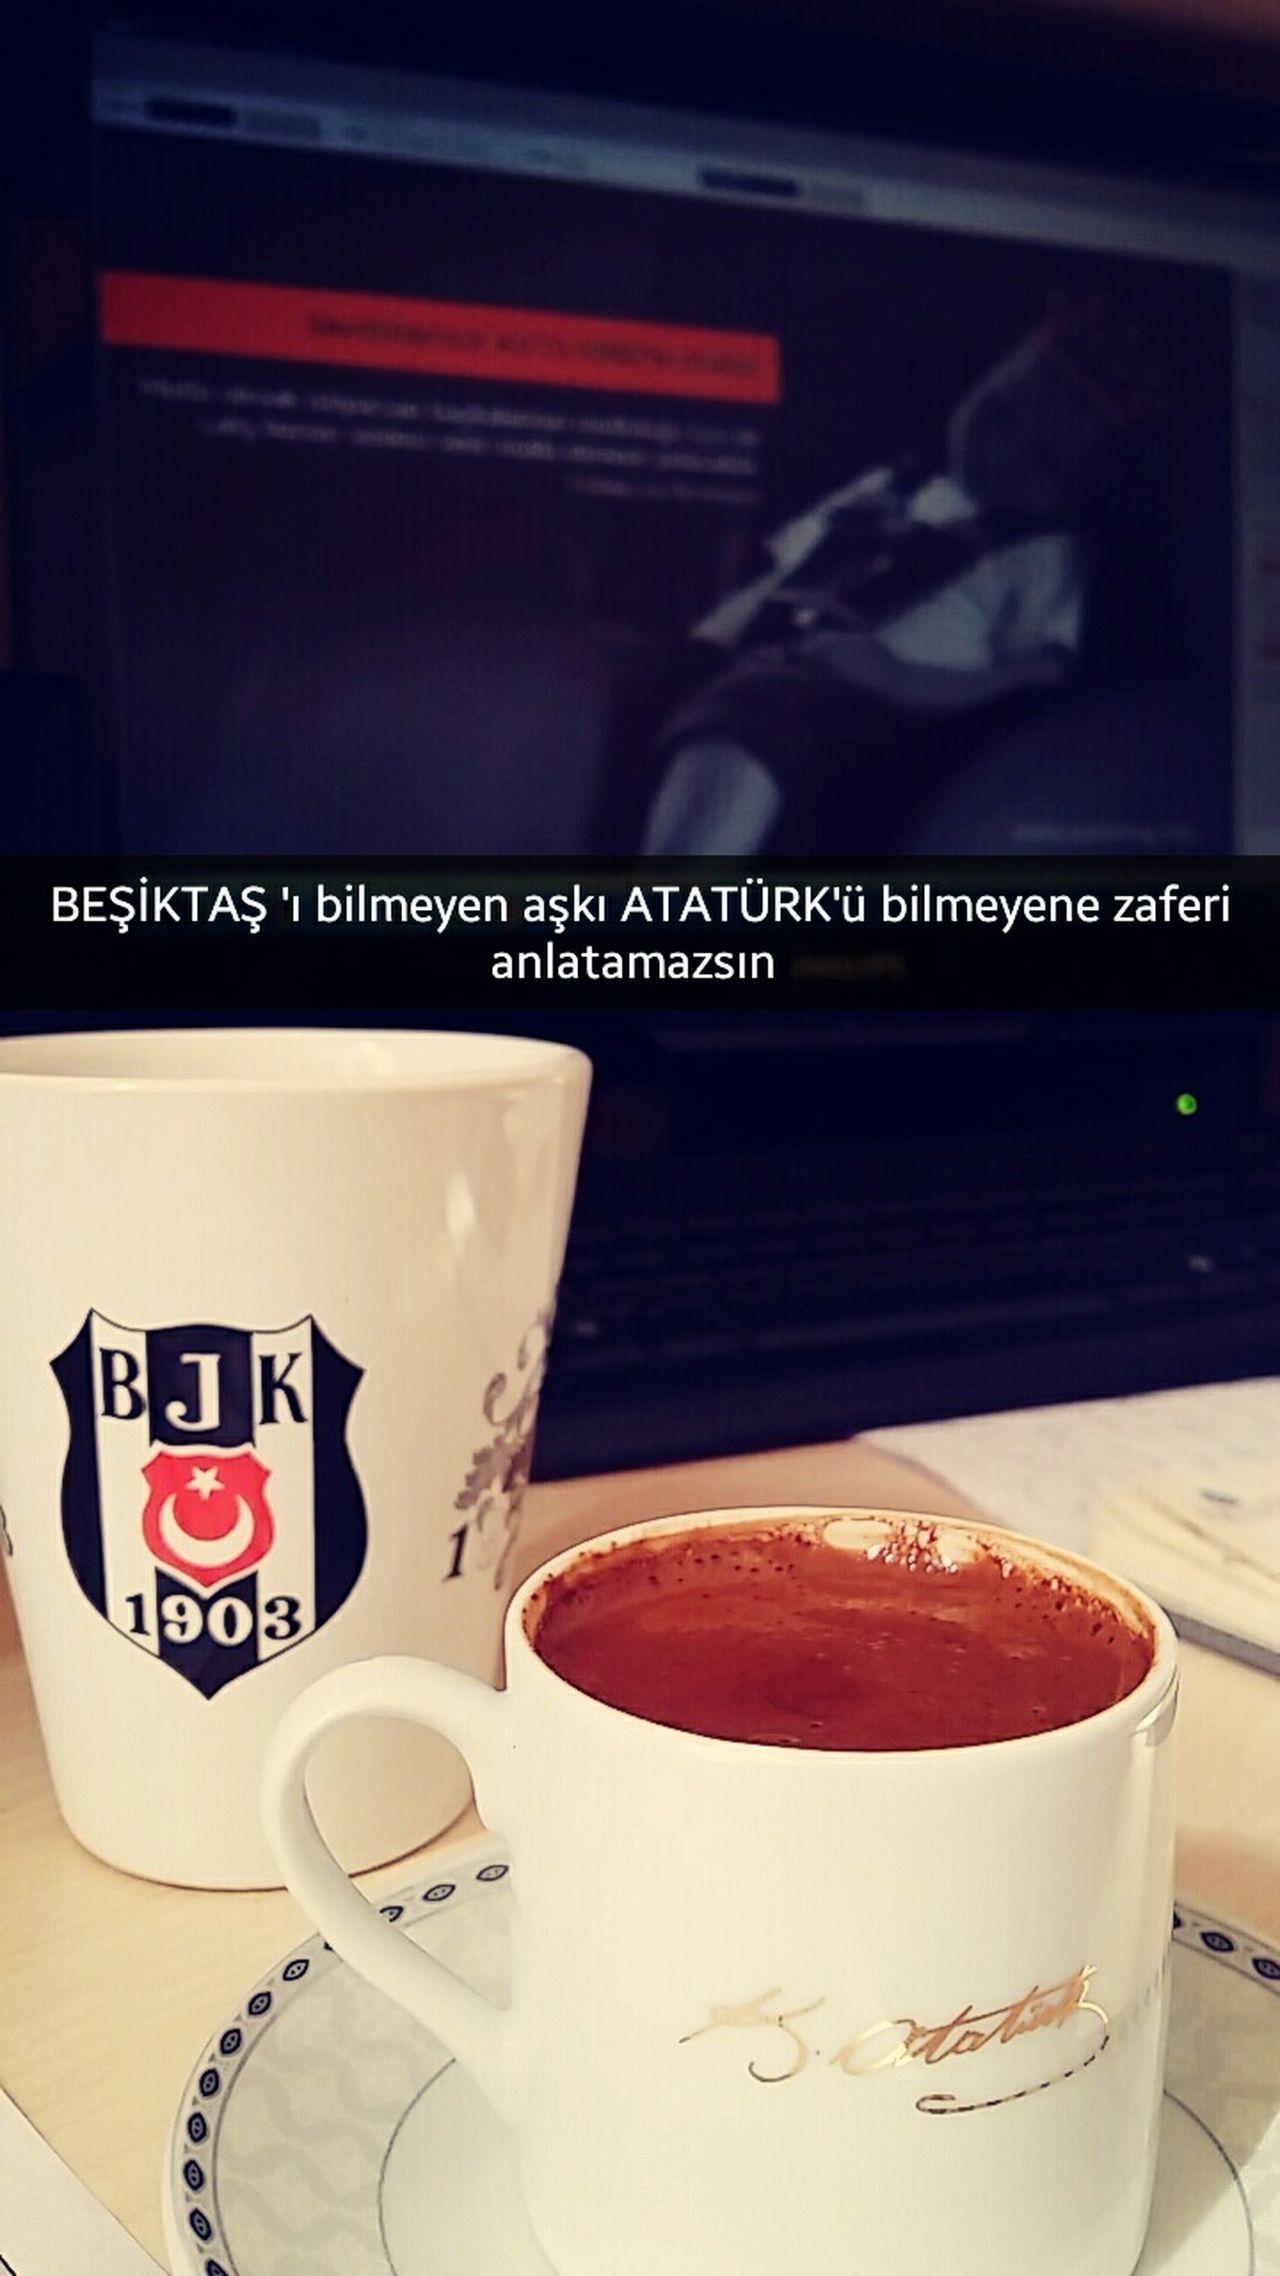 Mustafakemal #ataturk #atam Beşiktaş ❤ First Eyeem Photo